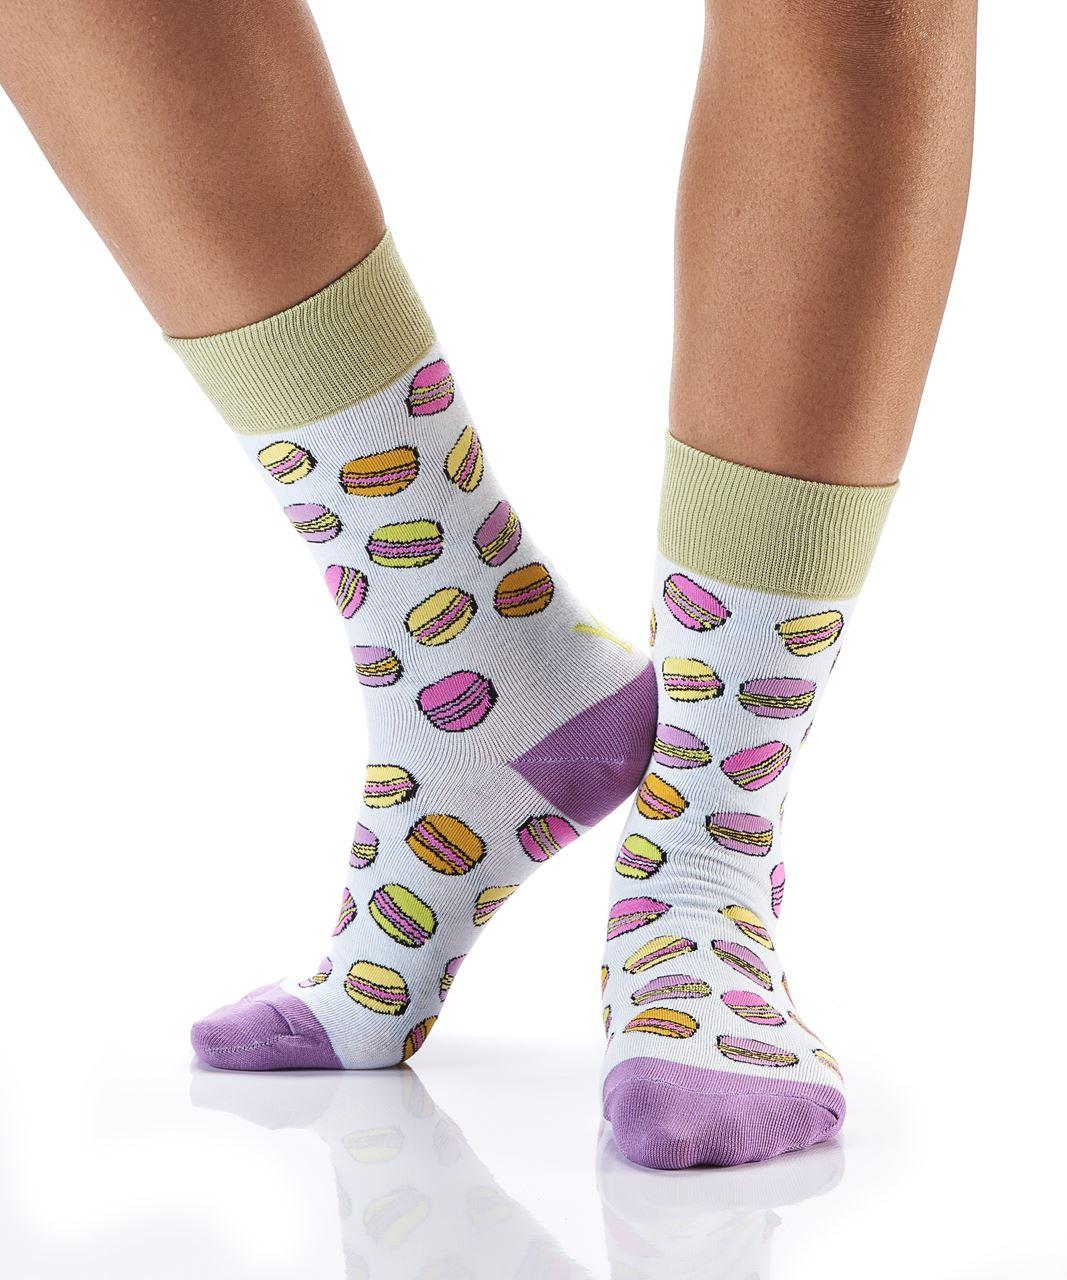 Macaroon Women's Crew Socks by Yo Sox